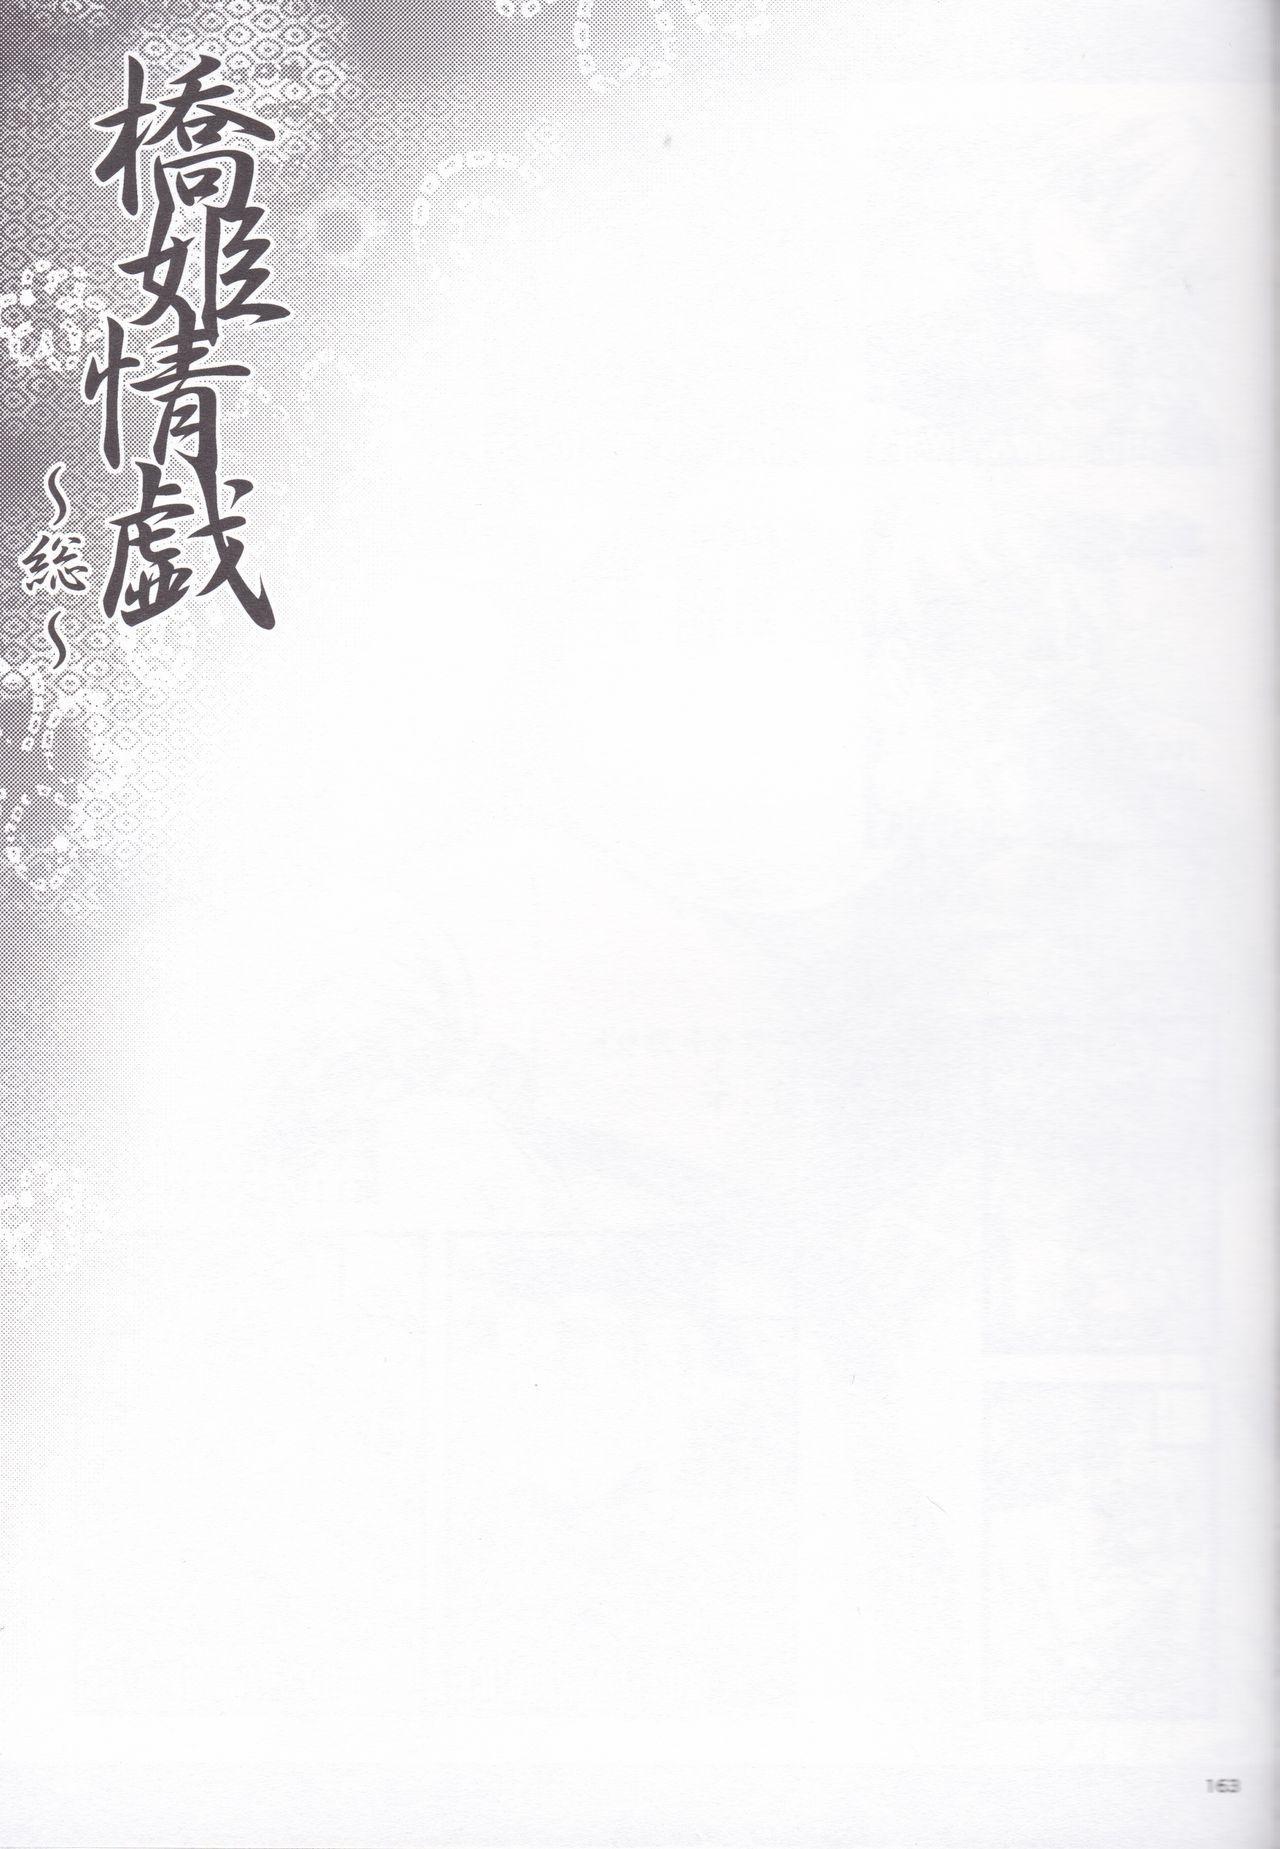 Hashihime Jougi 162